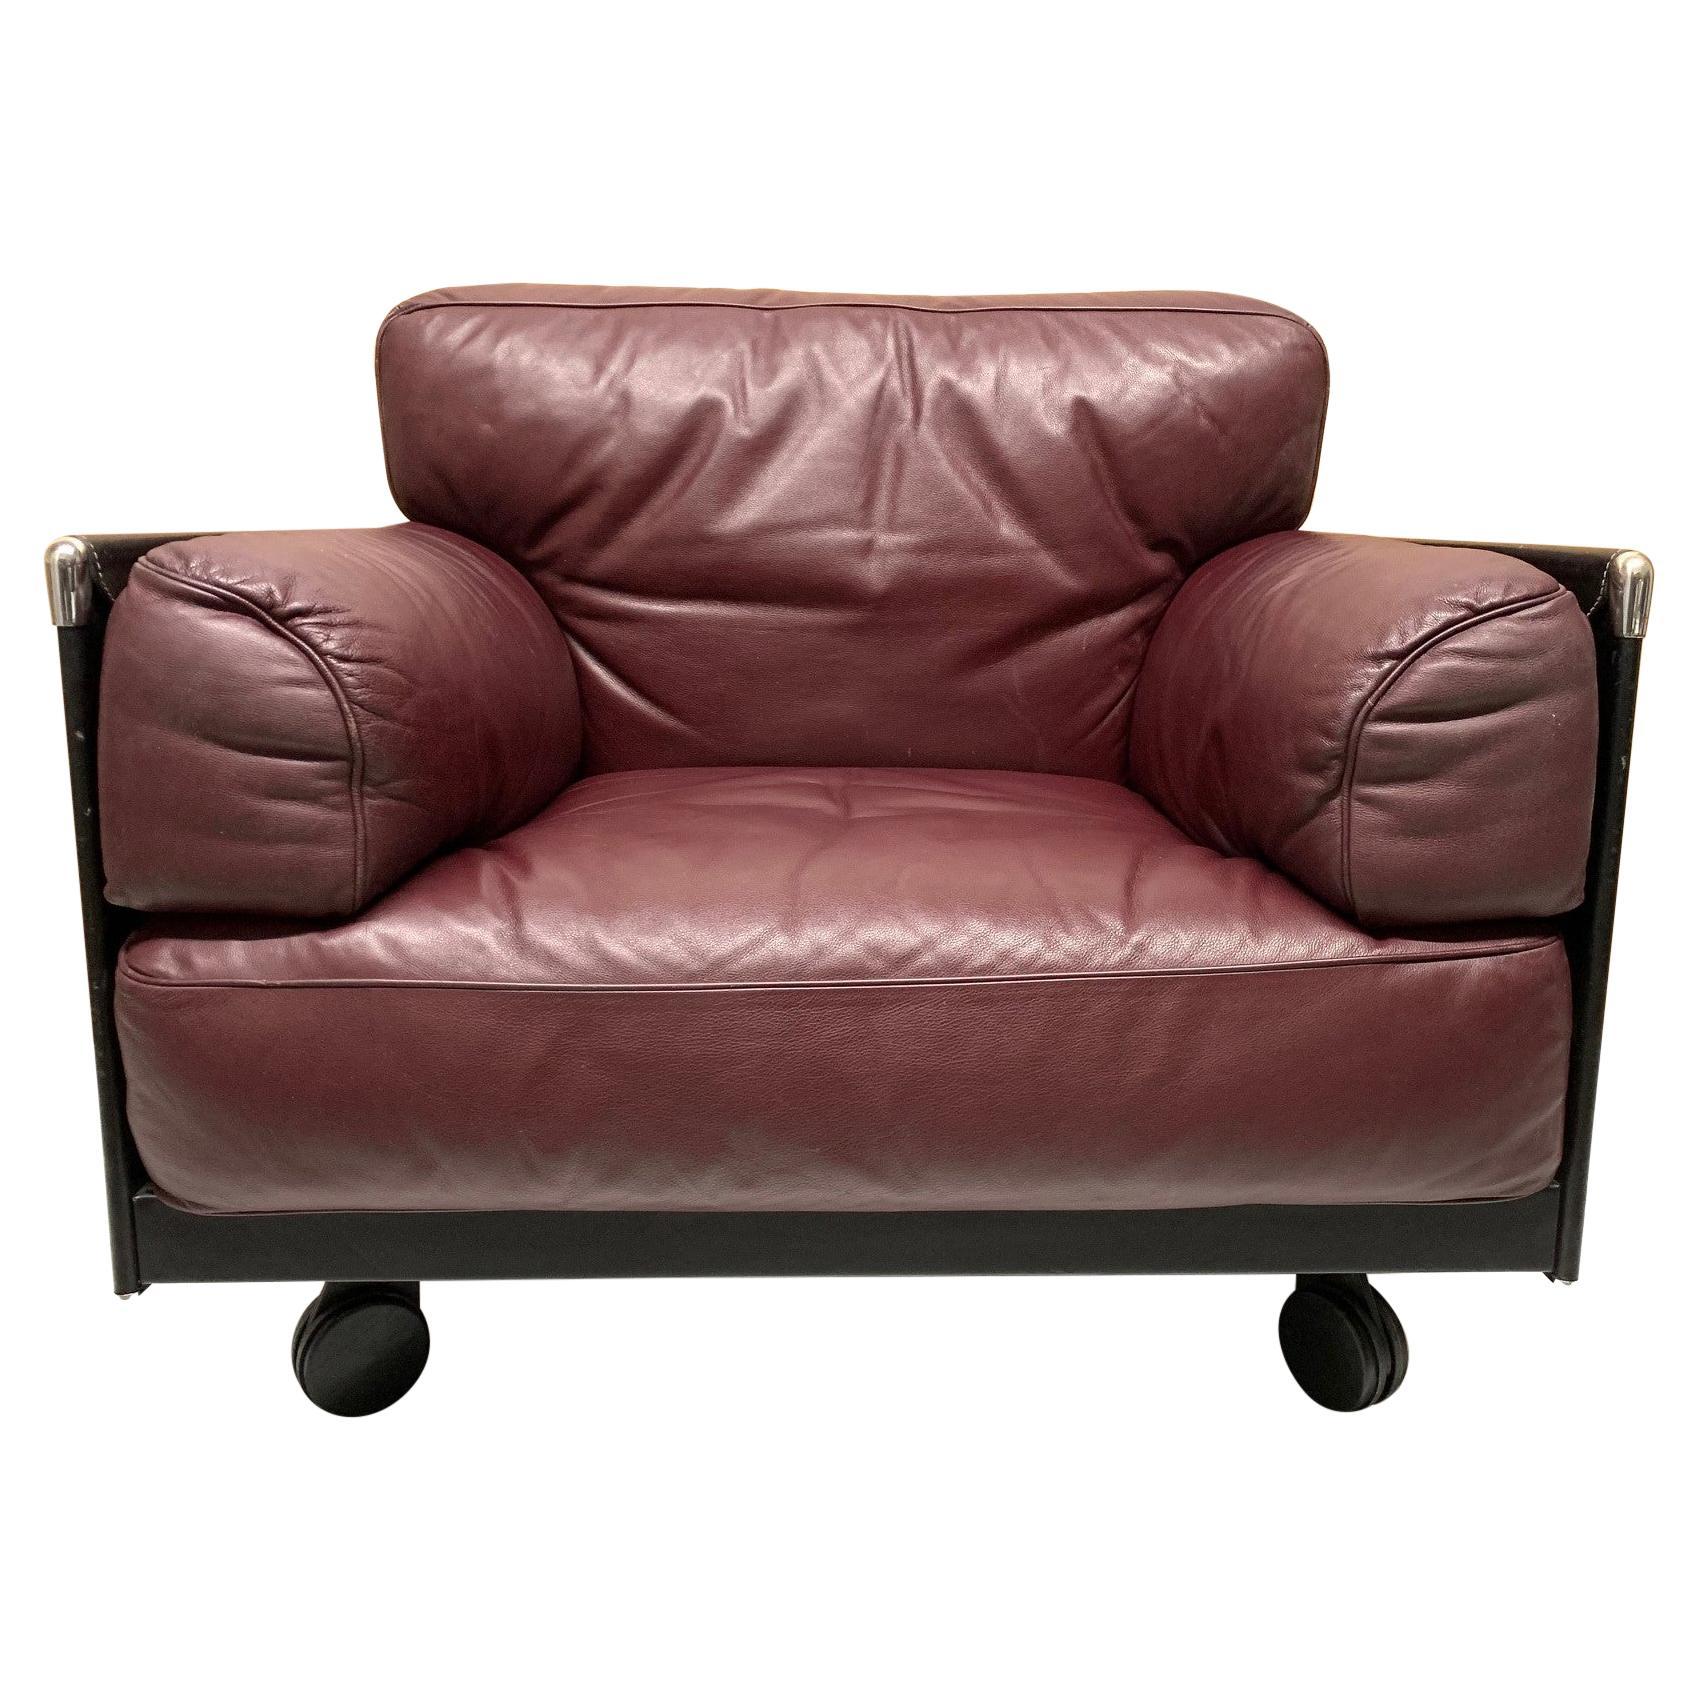 Leather Lounge Chair by Poltrona Frau